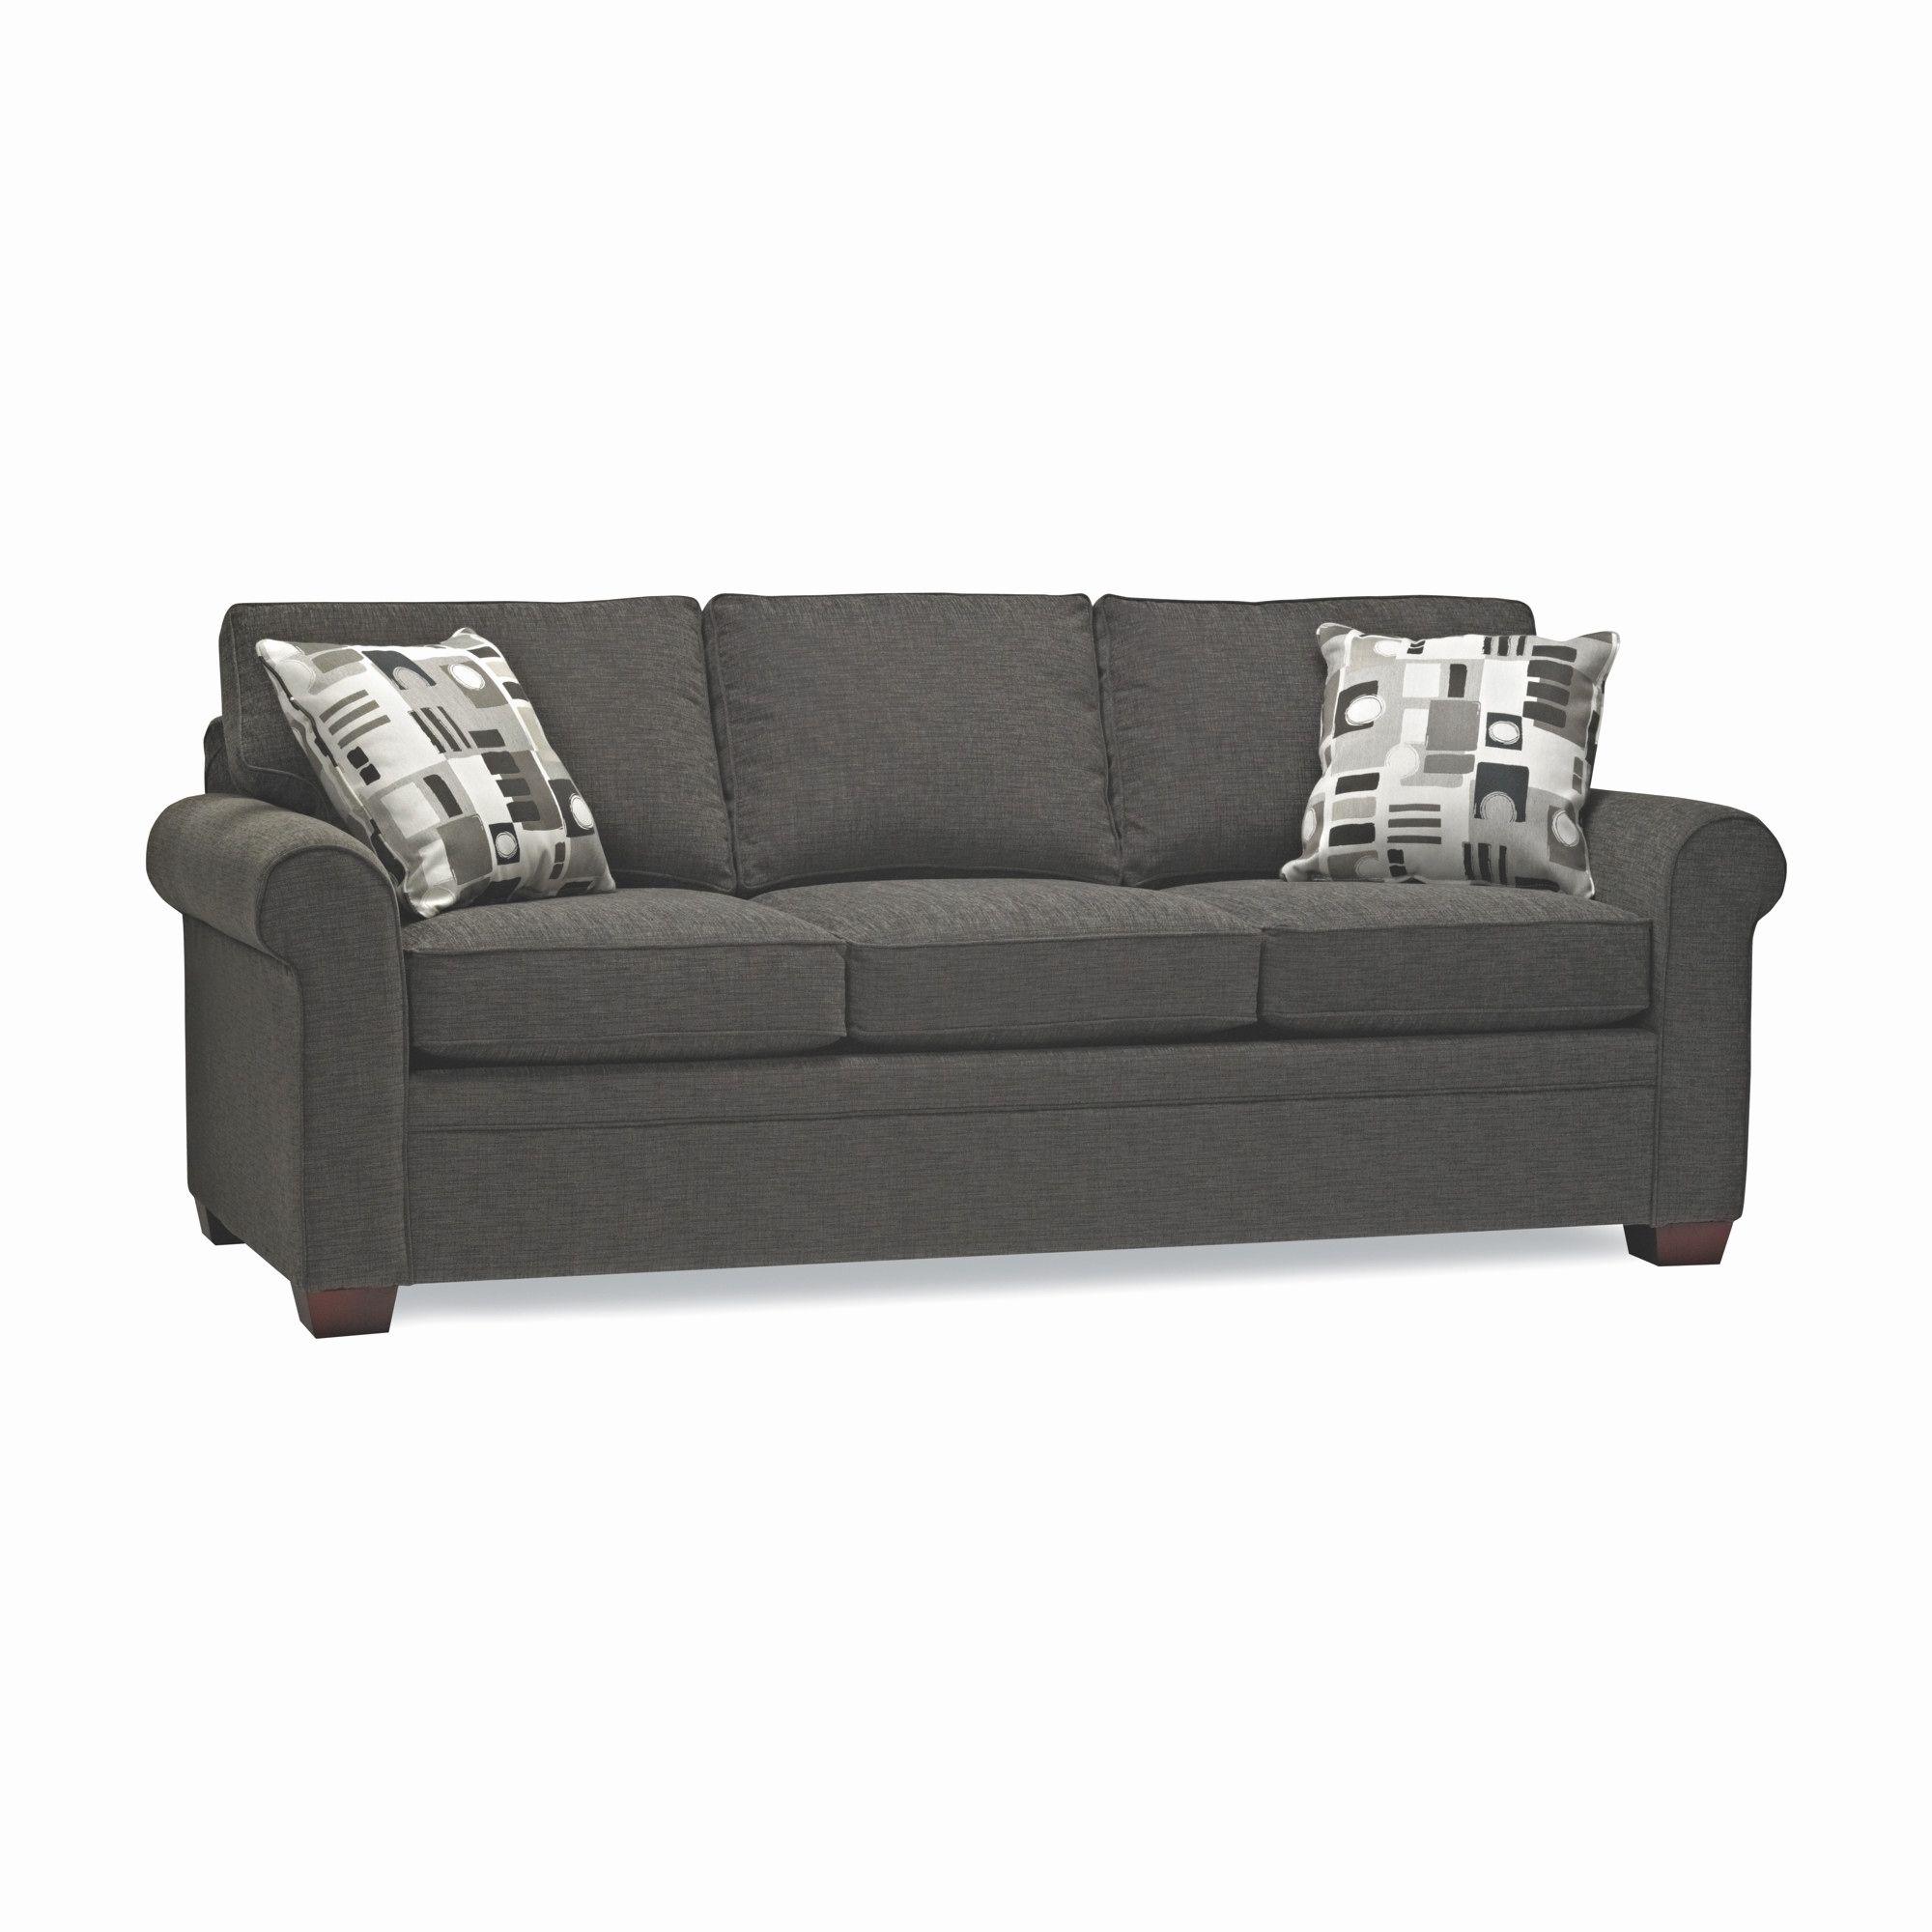 sofa futon microfiber couch folding bed mattress storage throughout